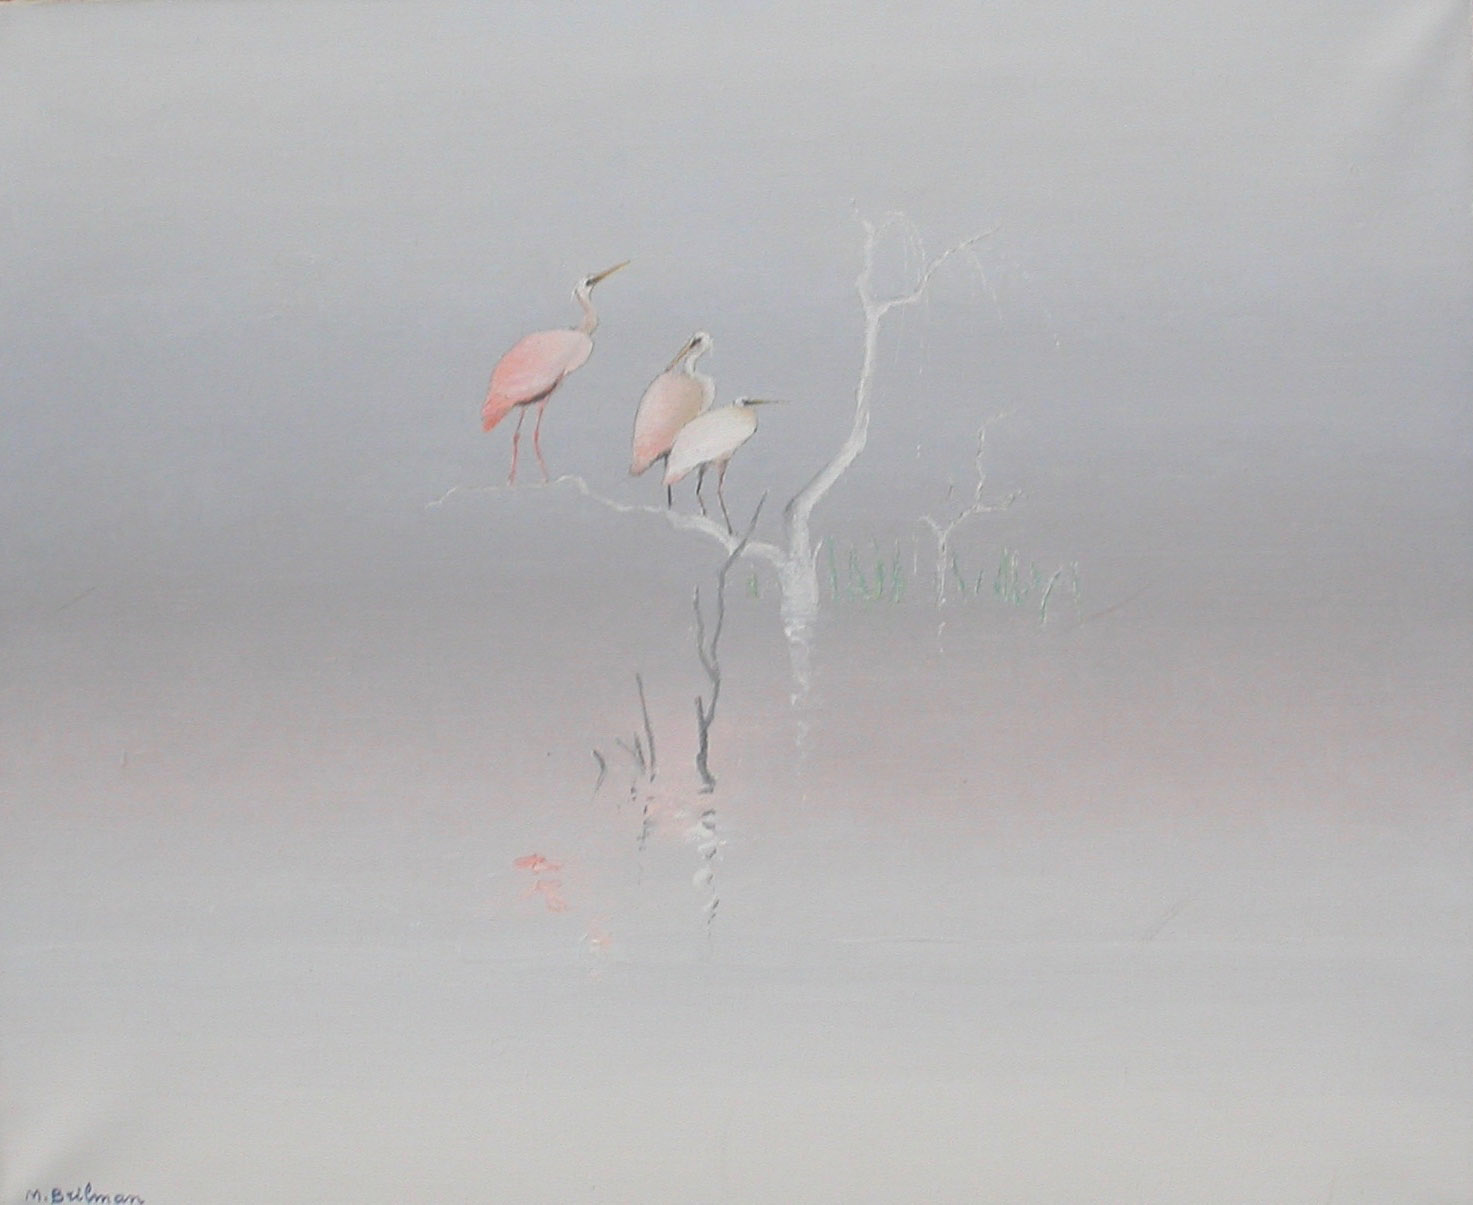 Egrets in the Amazon